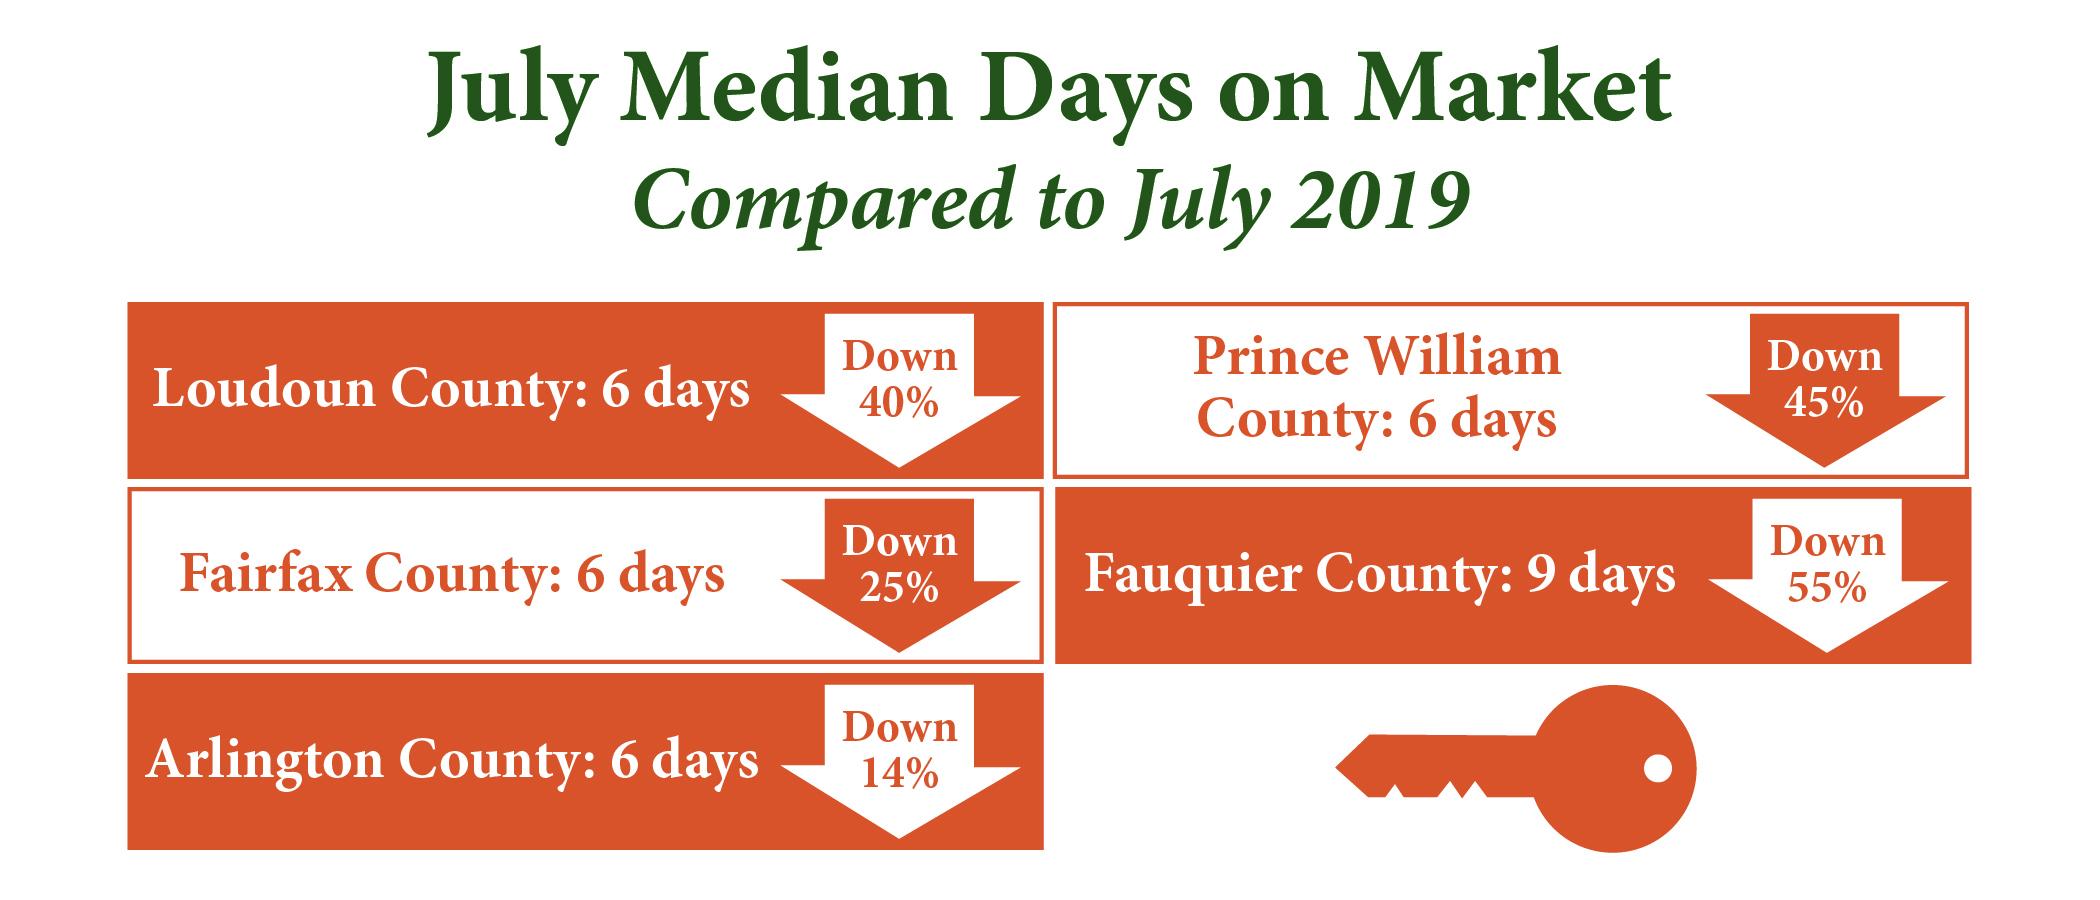 Northern Virginia Median Days on Market